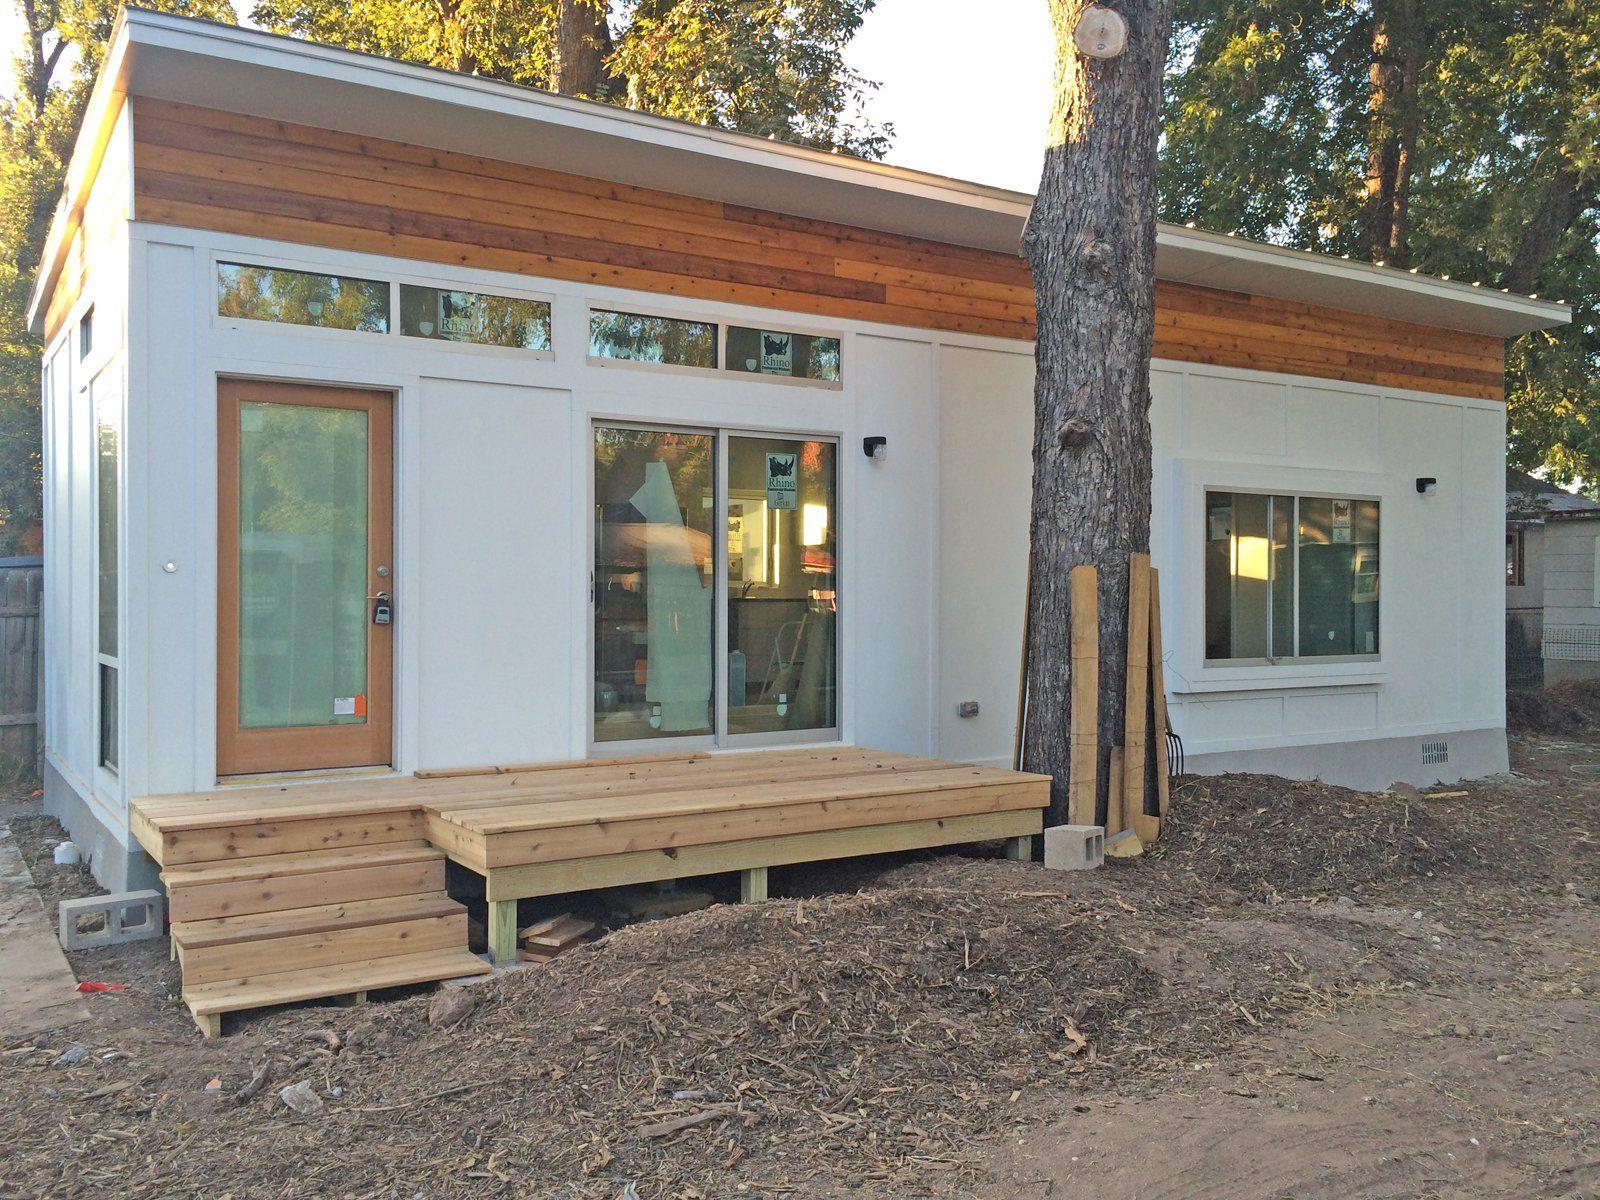 Modern Modular Homes For Sale From 10k To 200k Modern Modular